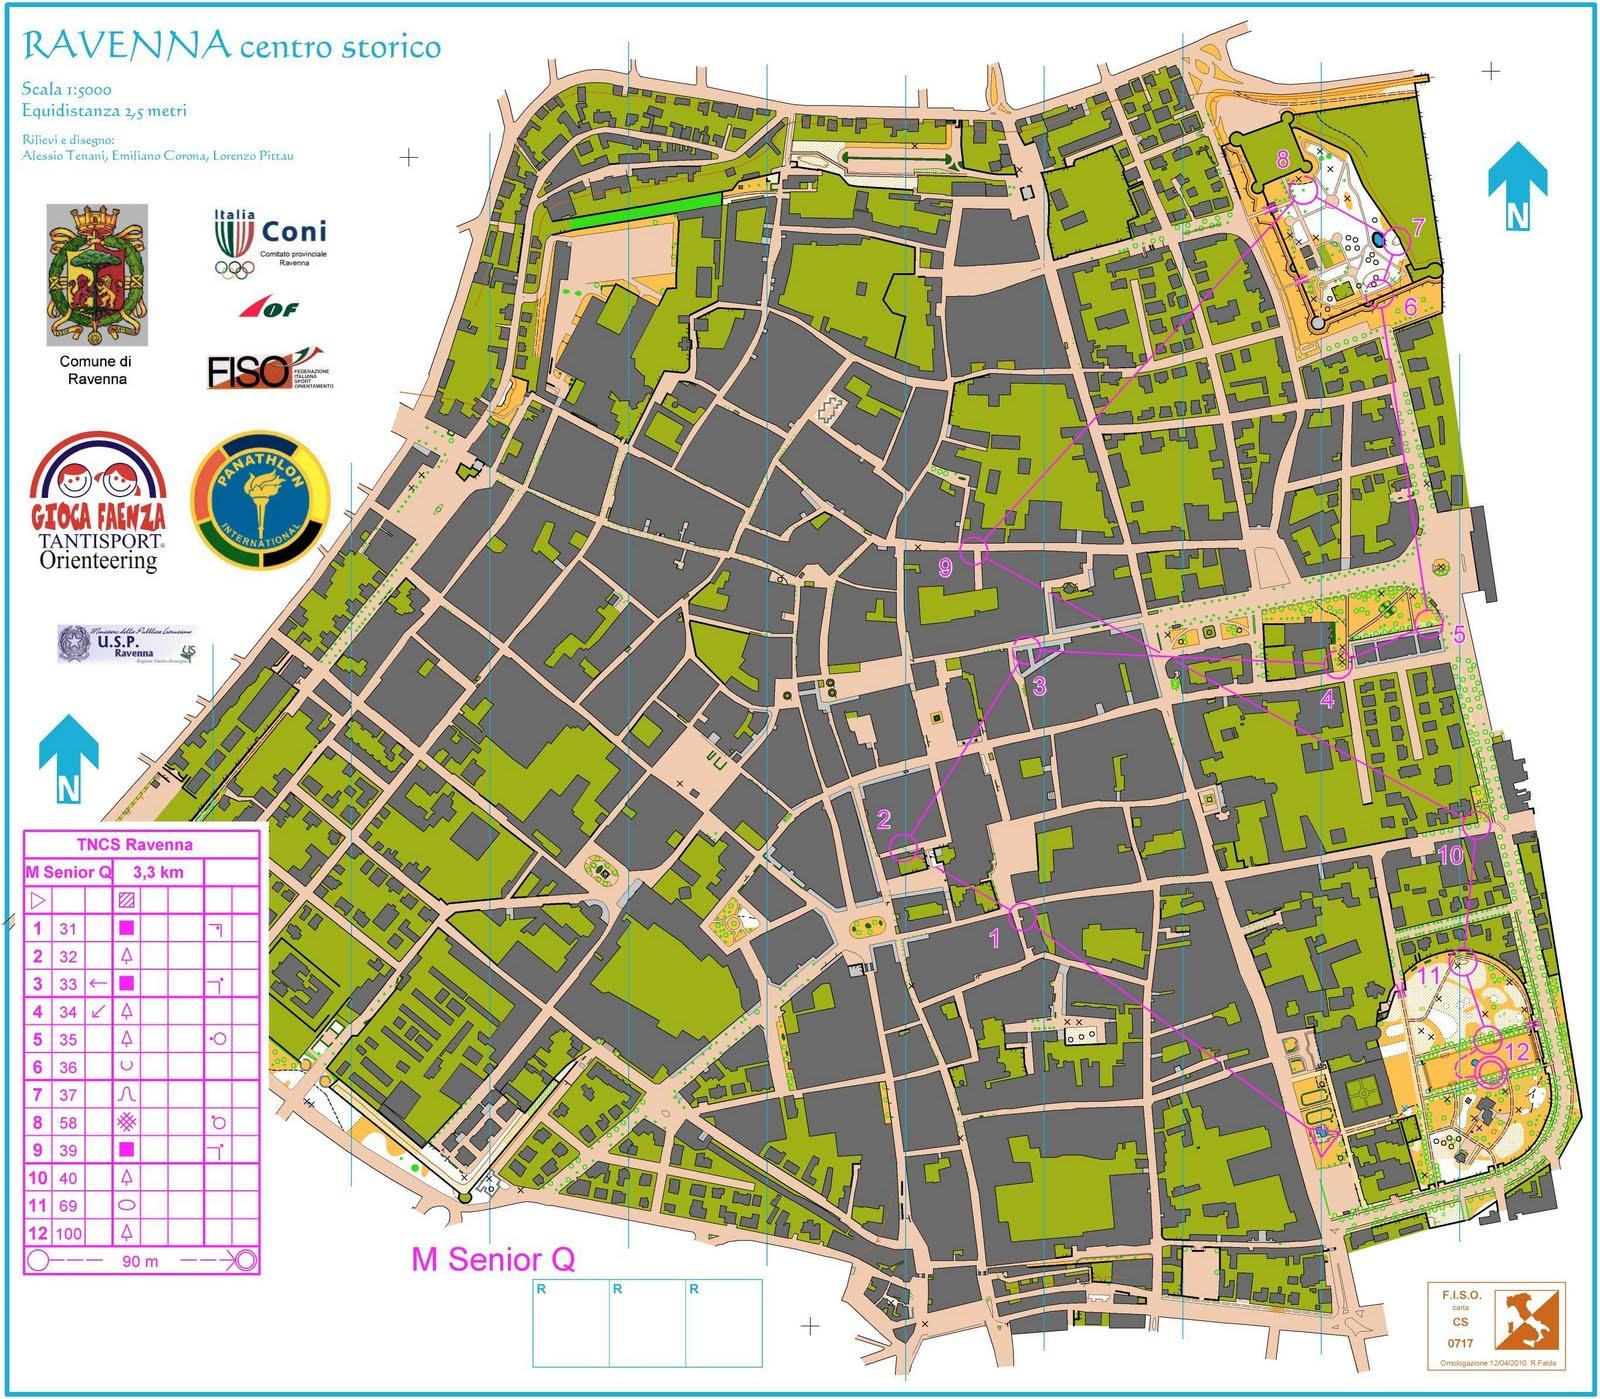 Orienteering Map Ravenna centro storico World of O Maps